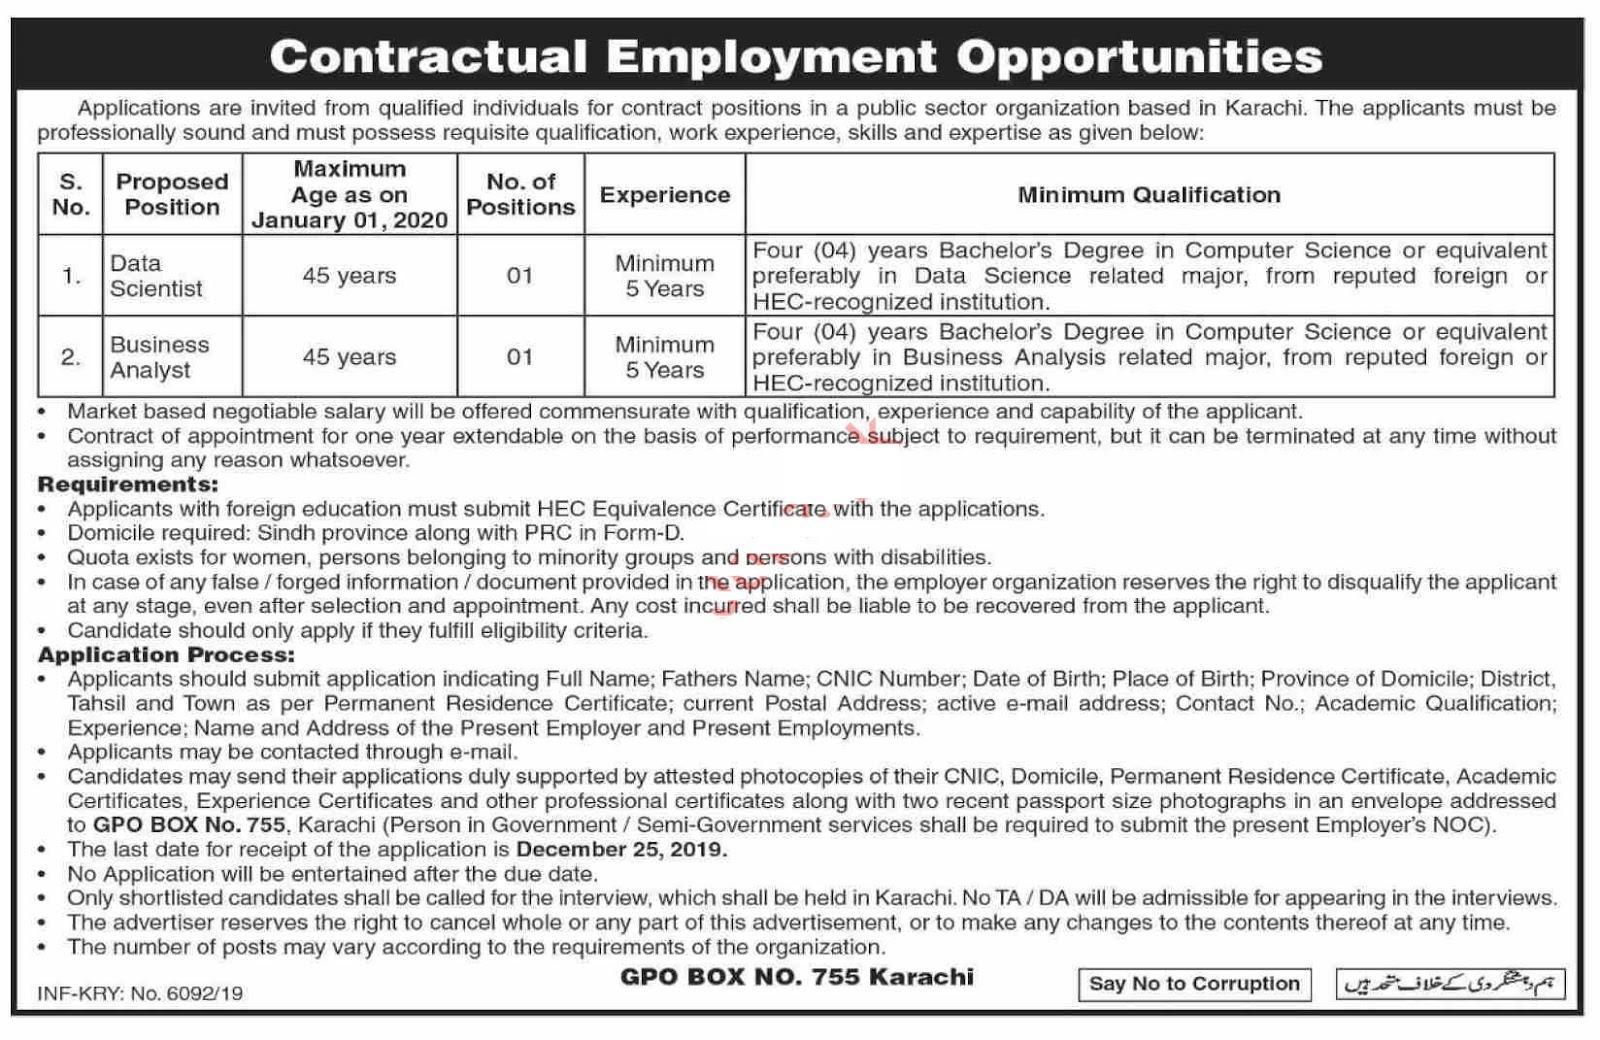 Public Sector Organization GPO Box No 755 Karachi Jobs 2019 Latest